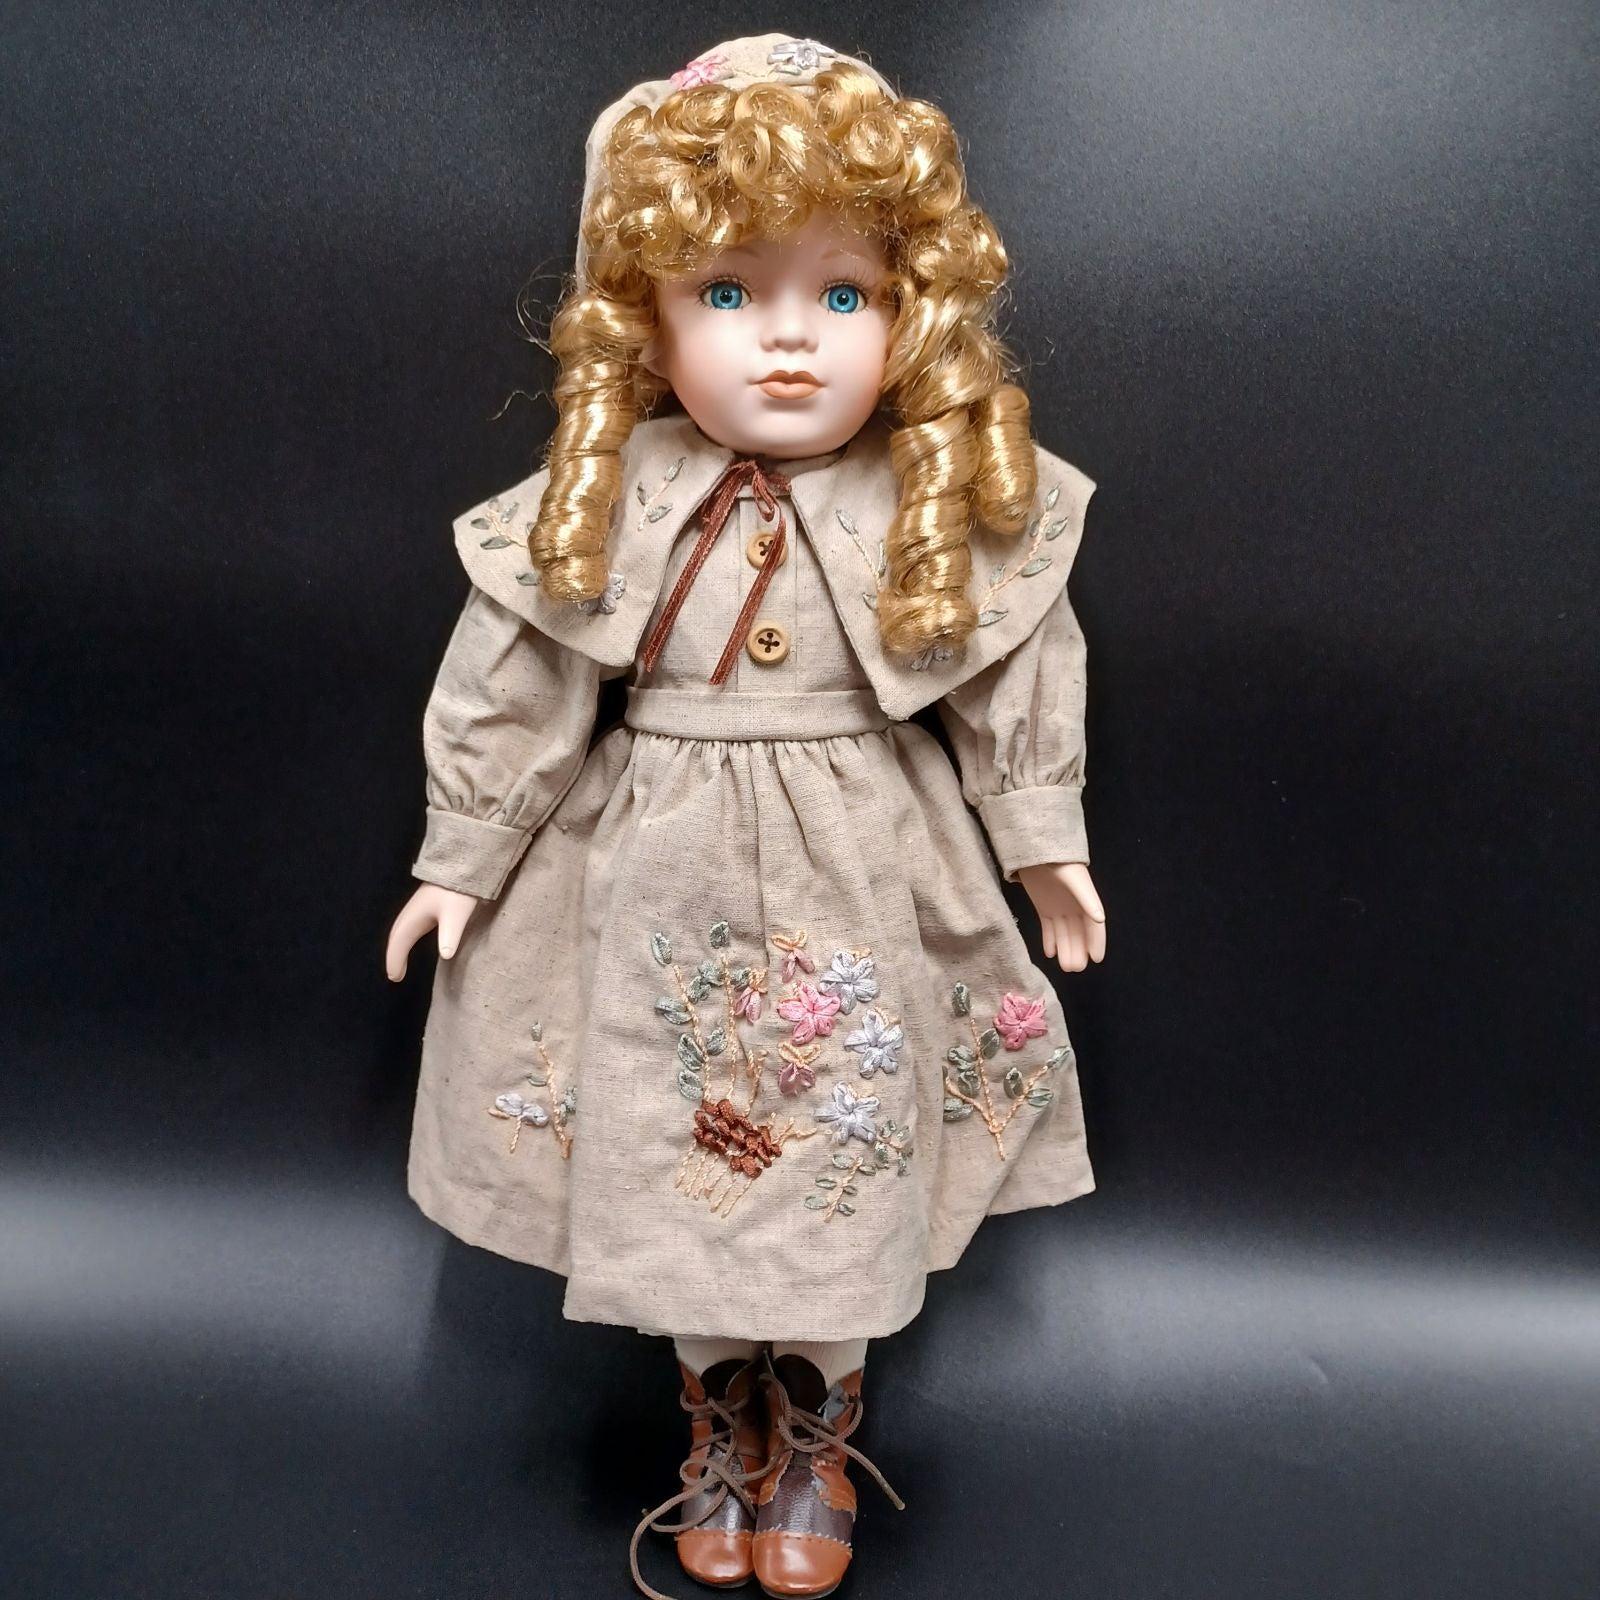 European Doll Porcelain collectible